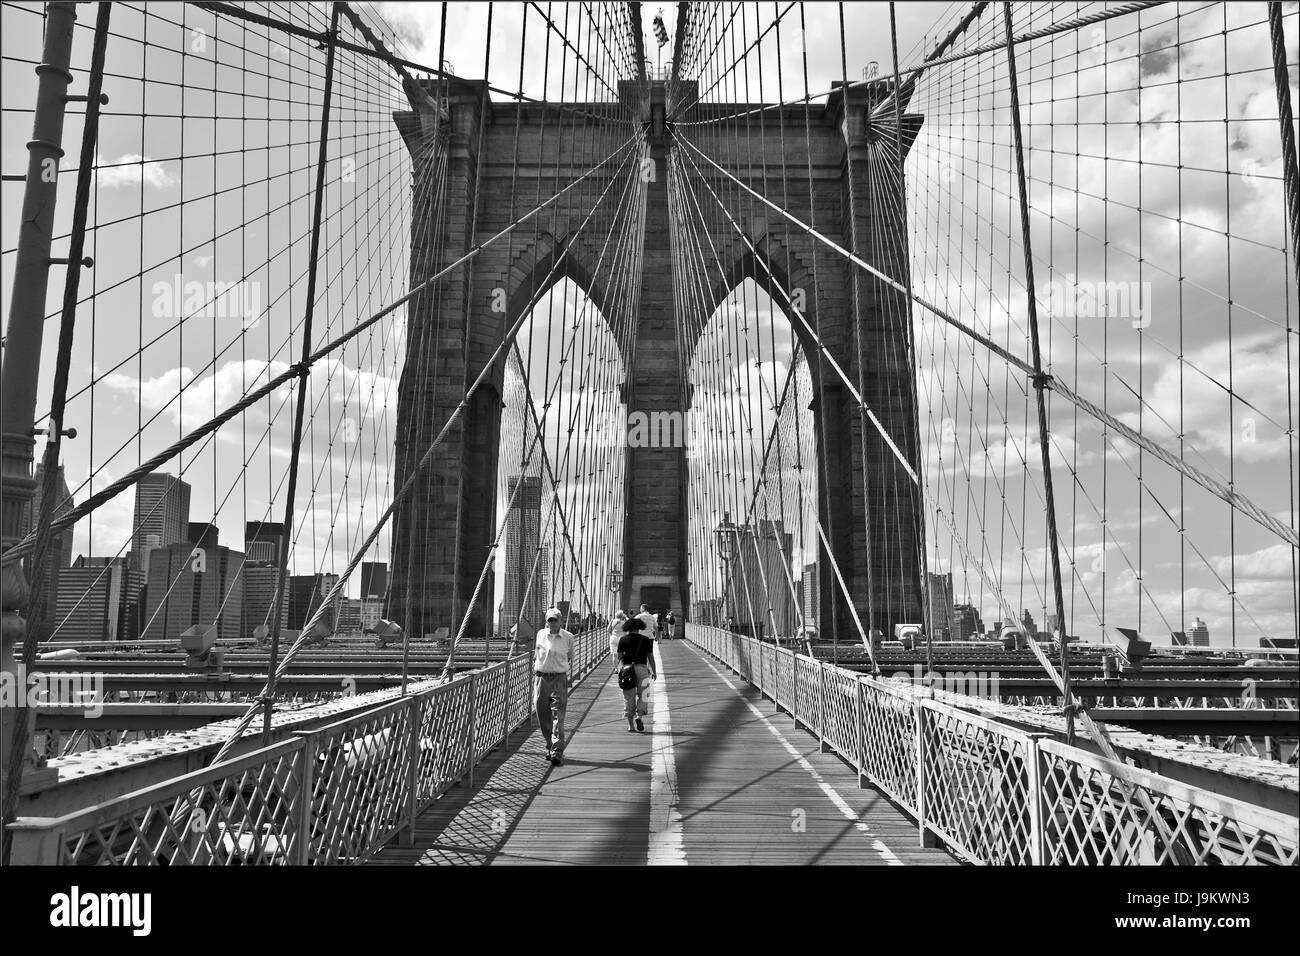 brooklyn bridge, new york, usa - Stock Image